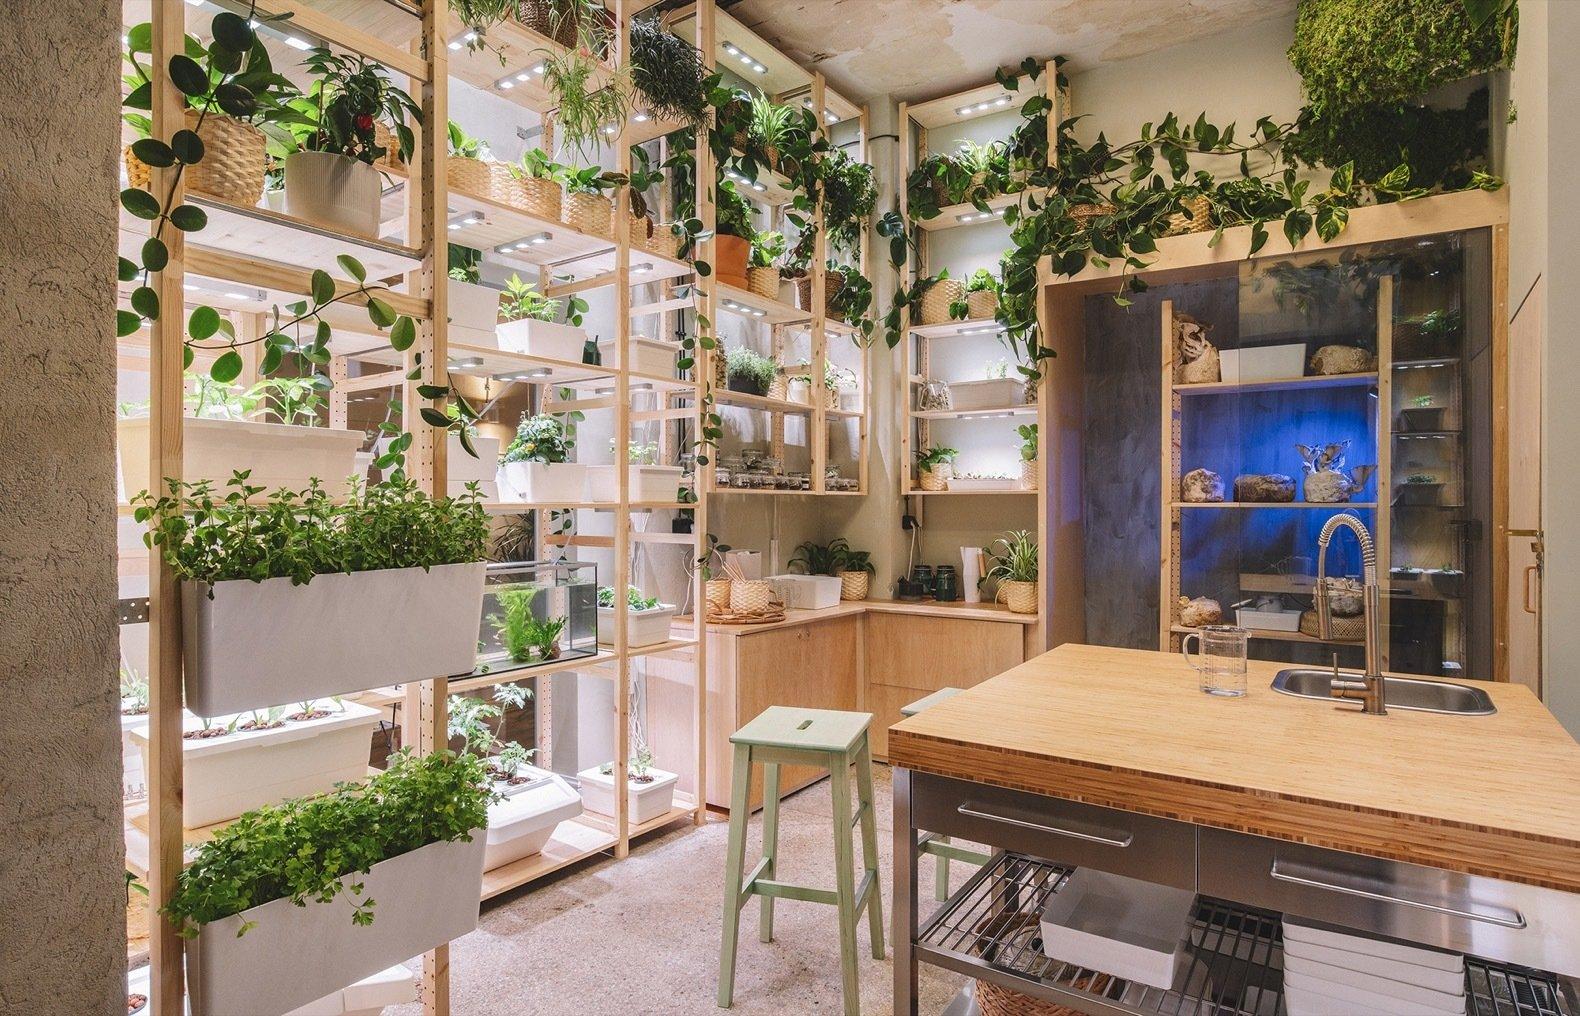 IKEA Home of Tomorrow home farm